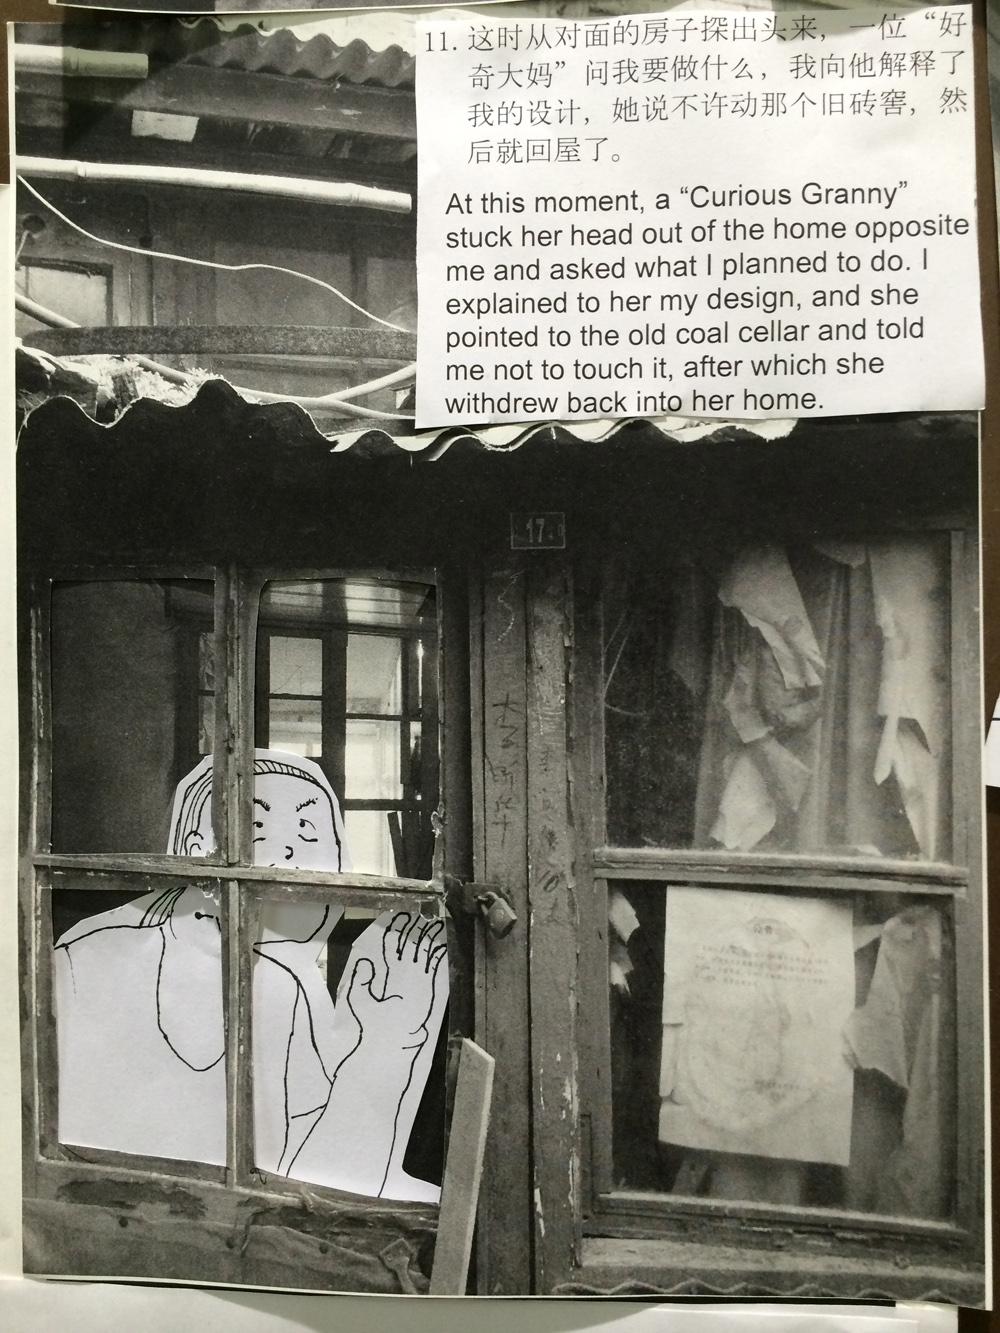 Caopu-humble-hostel-story-hisheji (11)